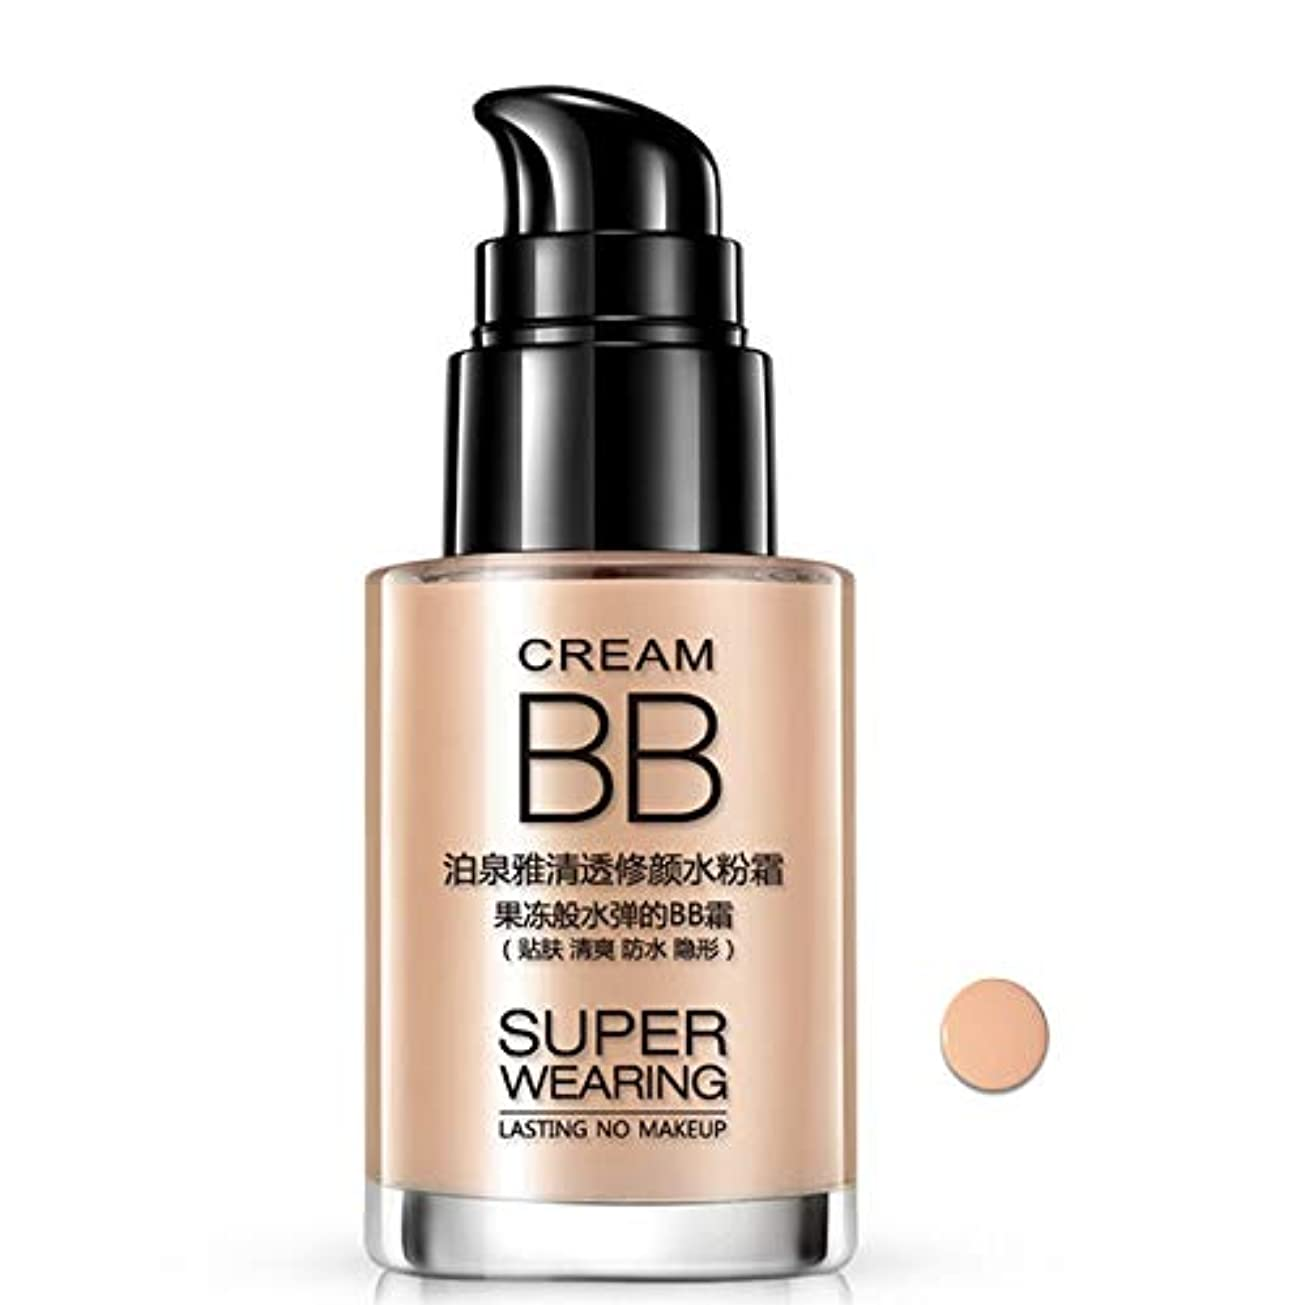 Symboat 30ml BBクリーム メイクアップベース 美白 保湿 オイルコントロール 防水 フェイスリ キッド ファンデーションコンシーラー美容 化粧品 ニキビ跡、クマ、を隠す 健康的な自然な肌色 素肌感